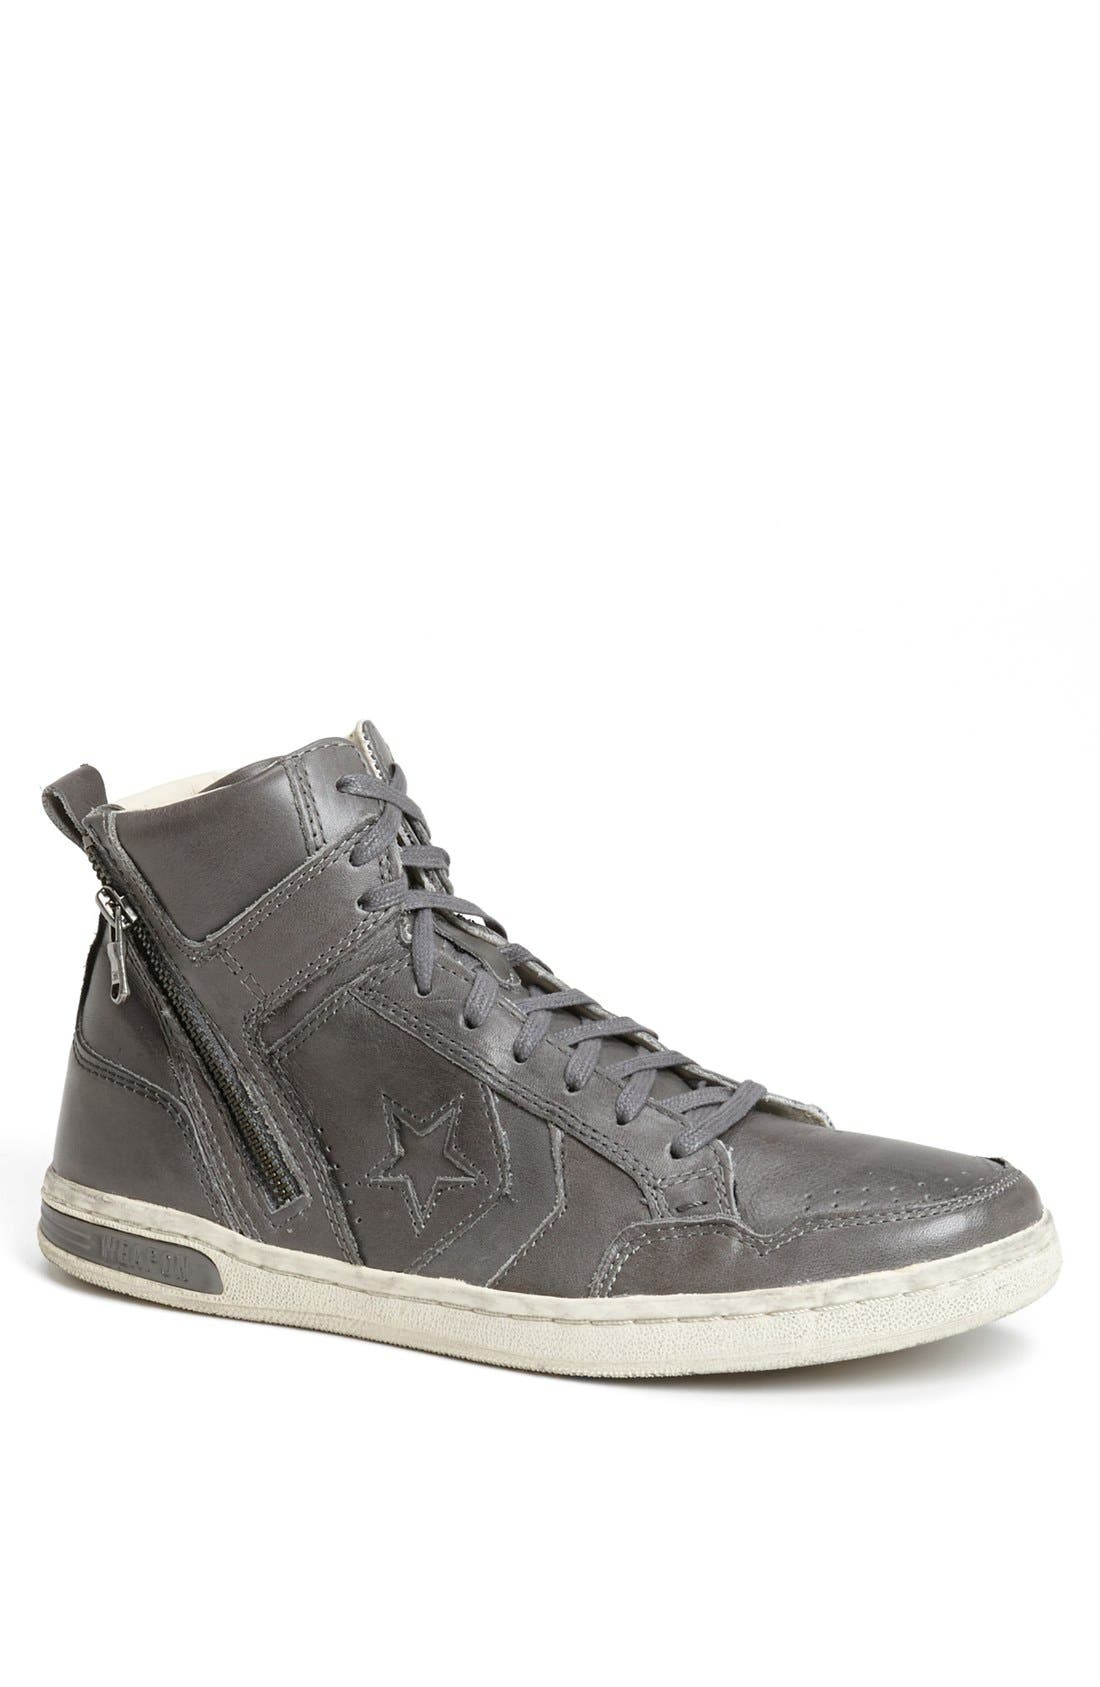 Alternate Image 1 Selected - Converse by John Varvatos 'JV Weapon' Sneaker (Men)